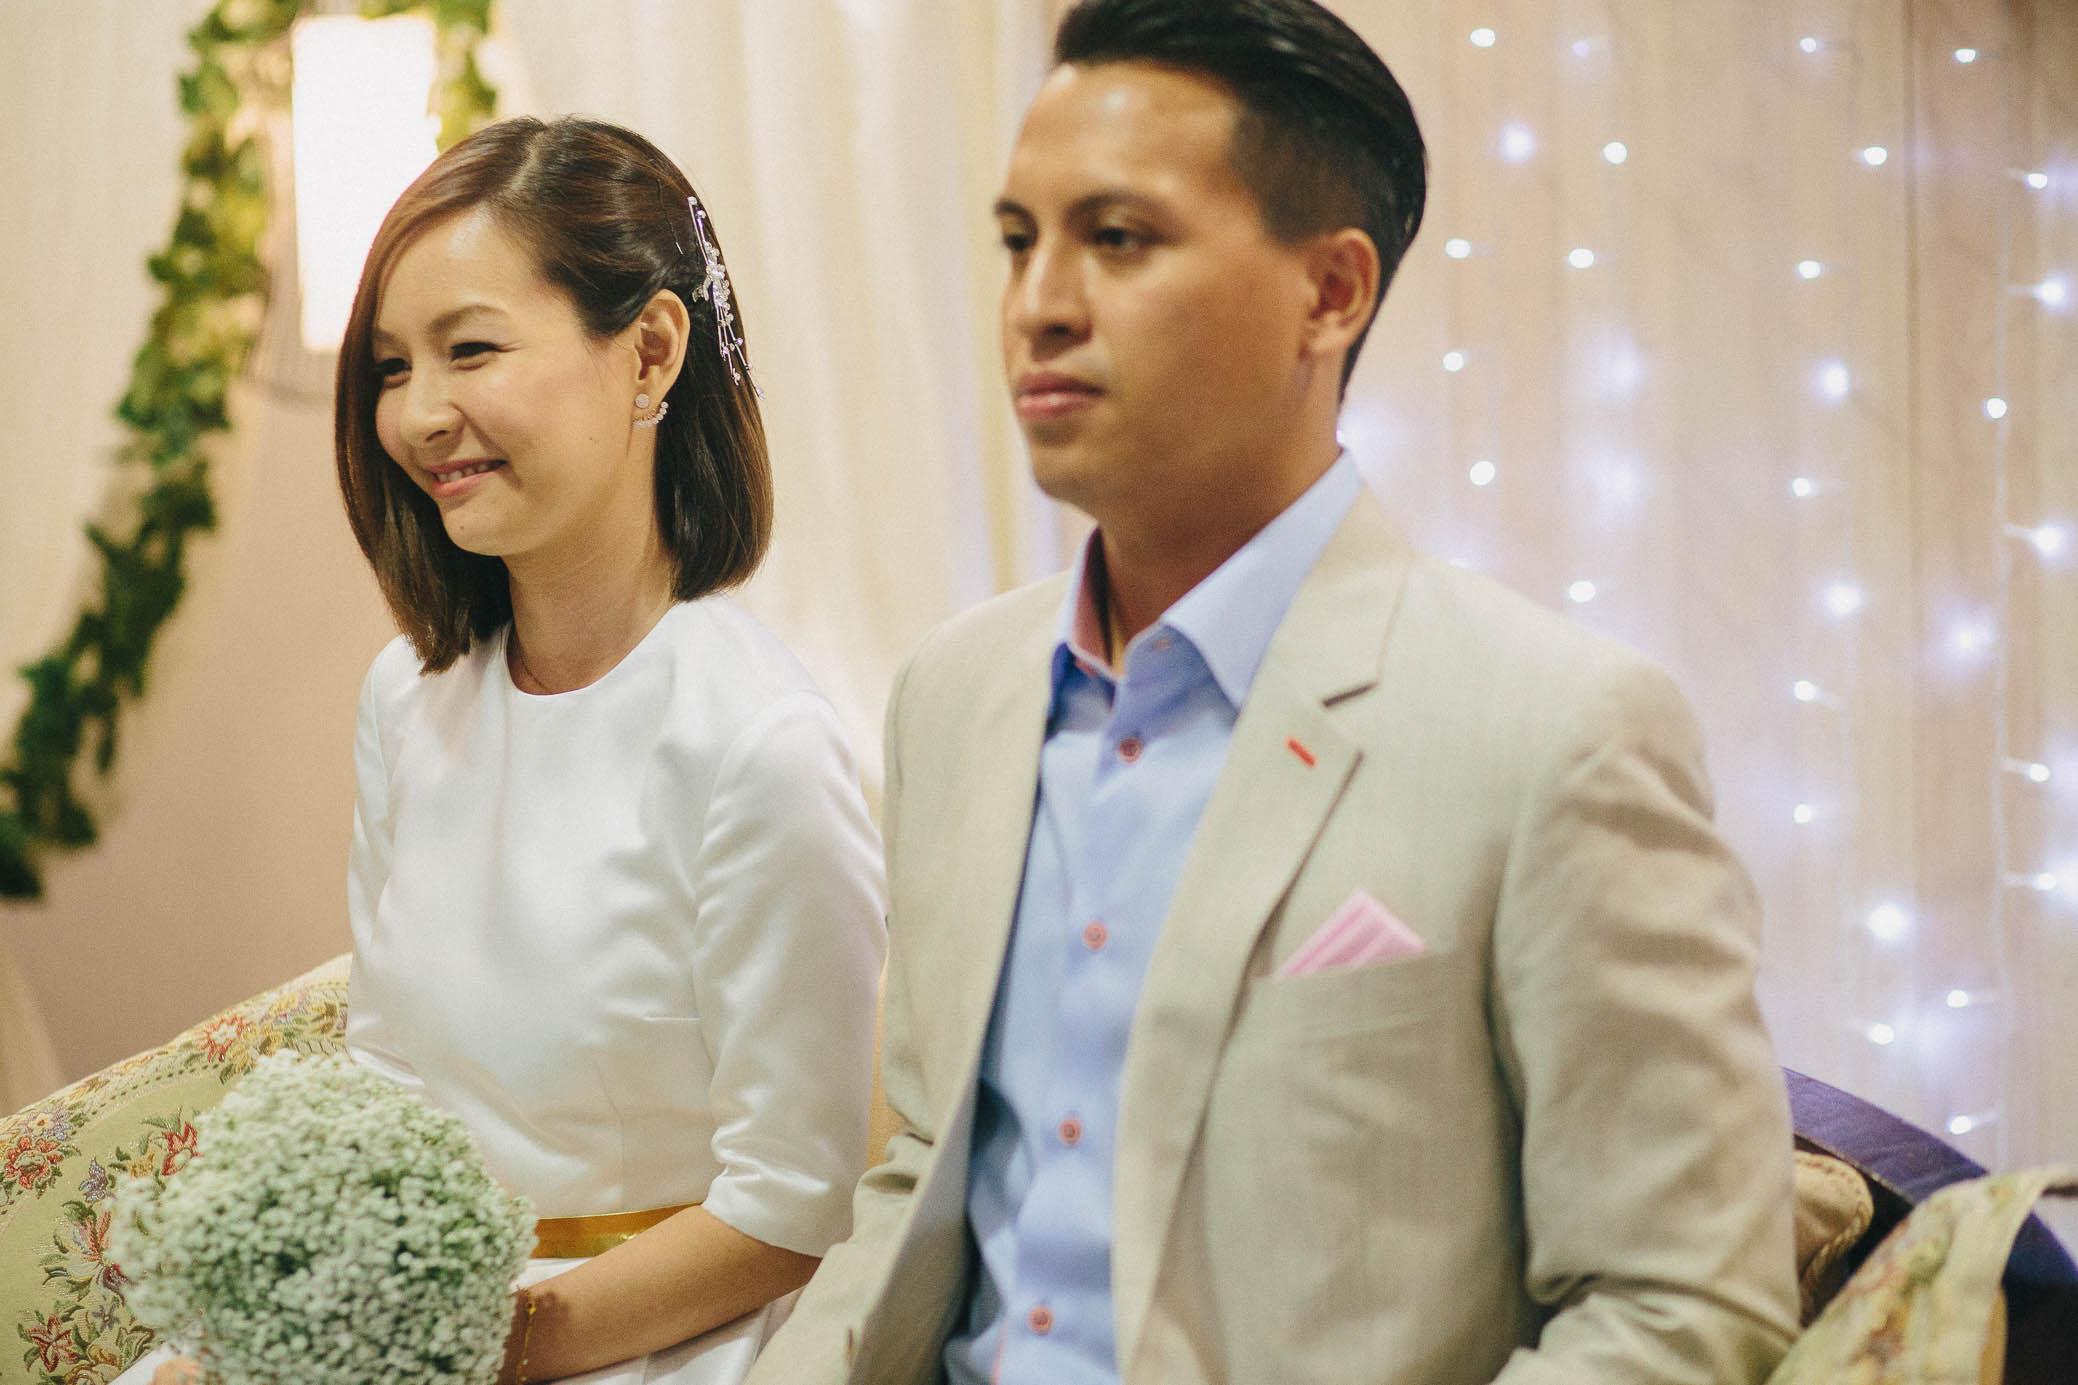 singapore-wedding-photographer-malay-indian-pre-wedding-travel-wmt-2015-alif-ethel-50.jpg